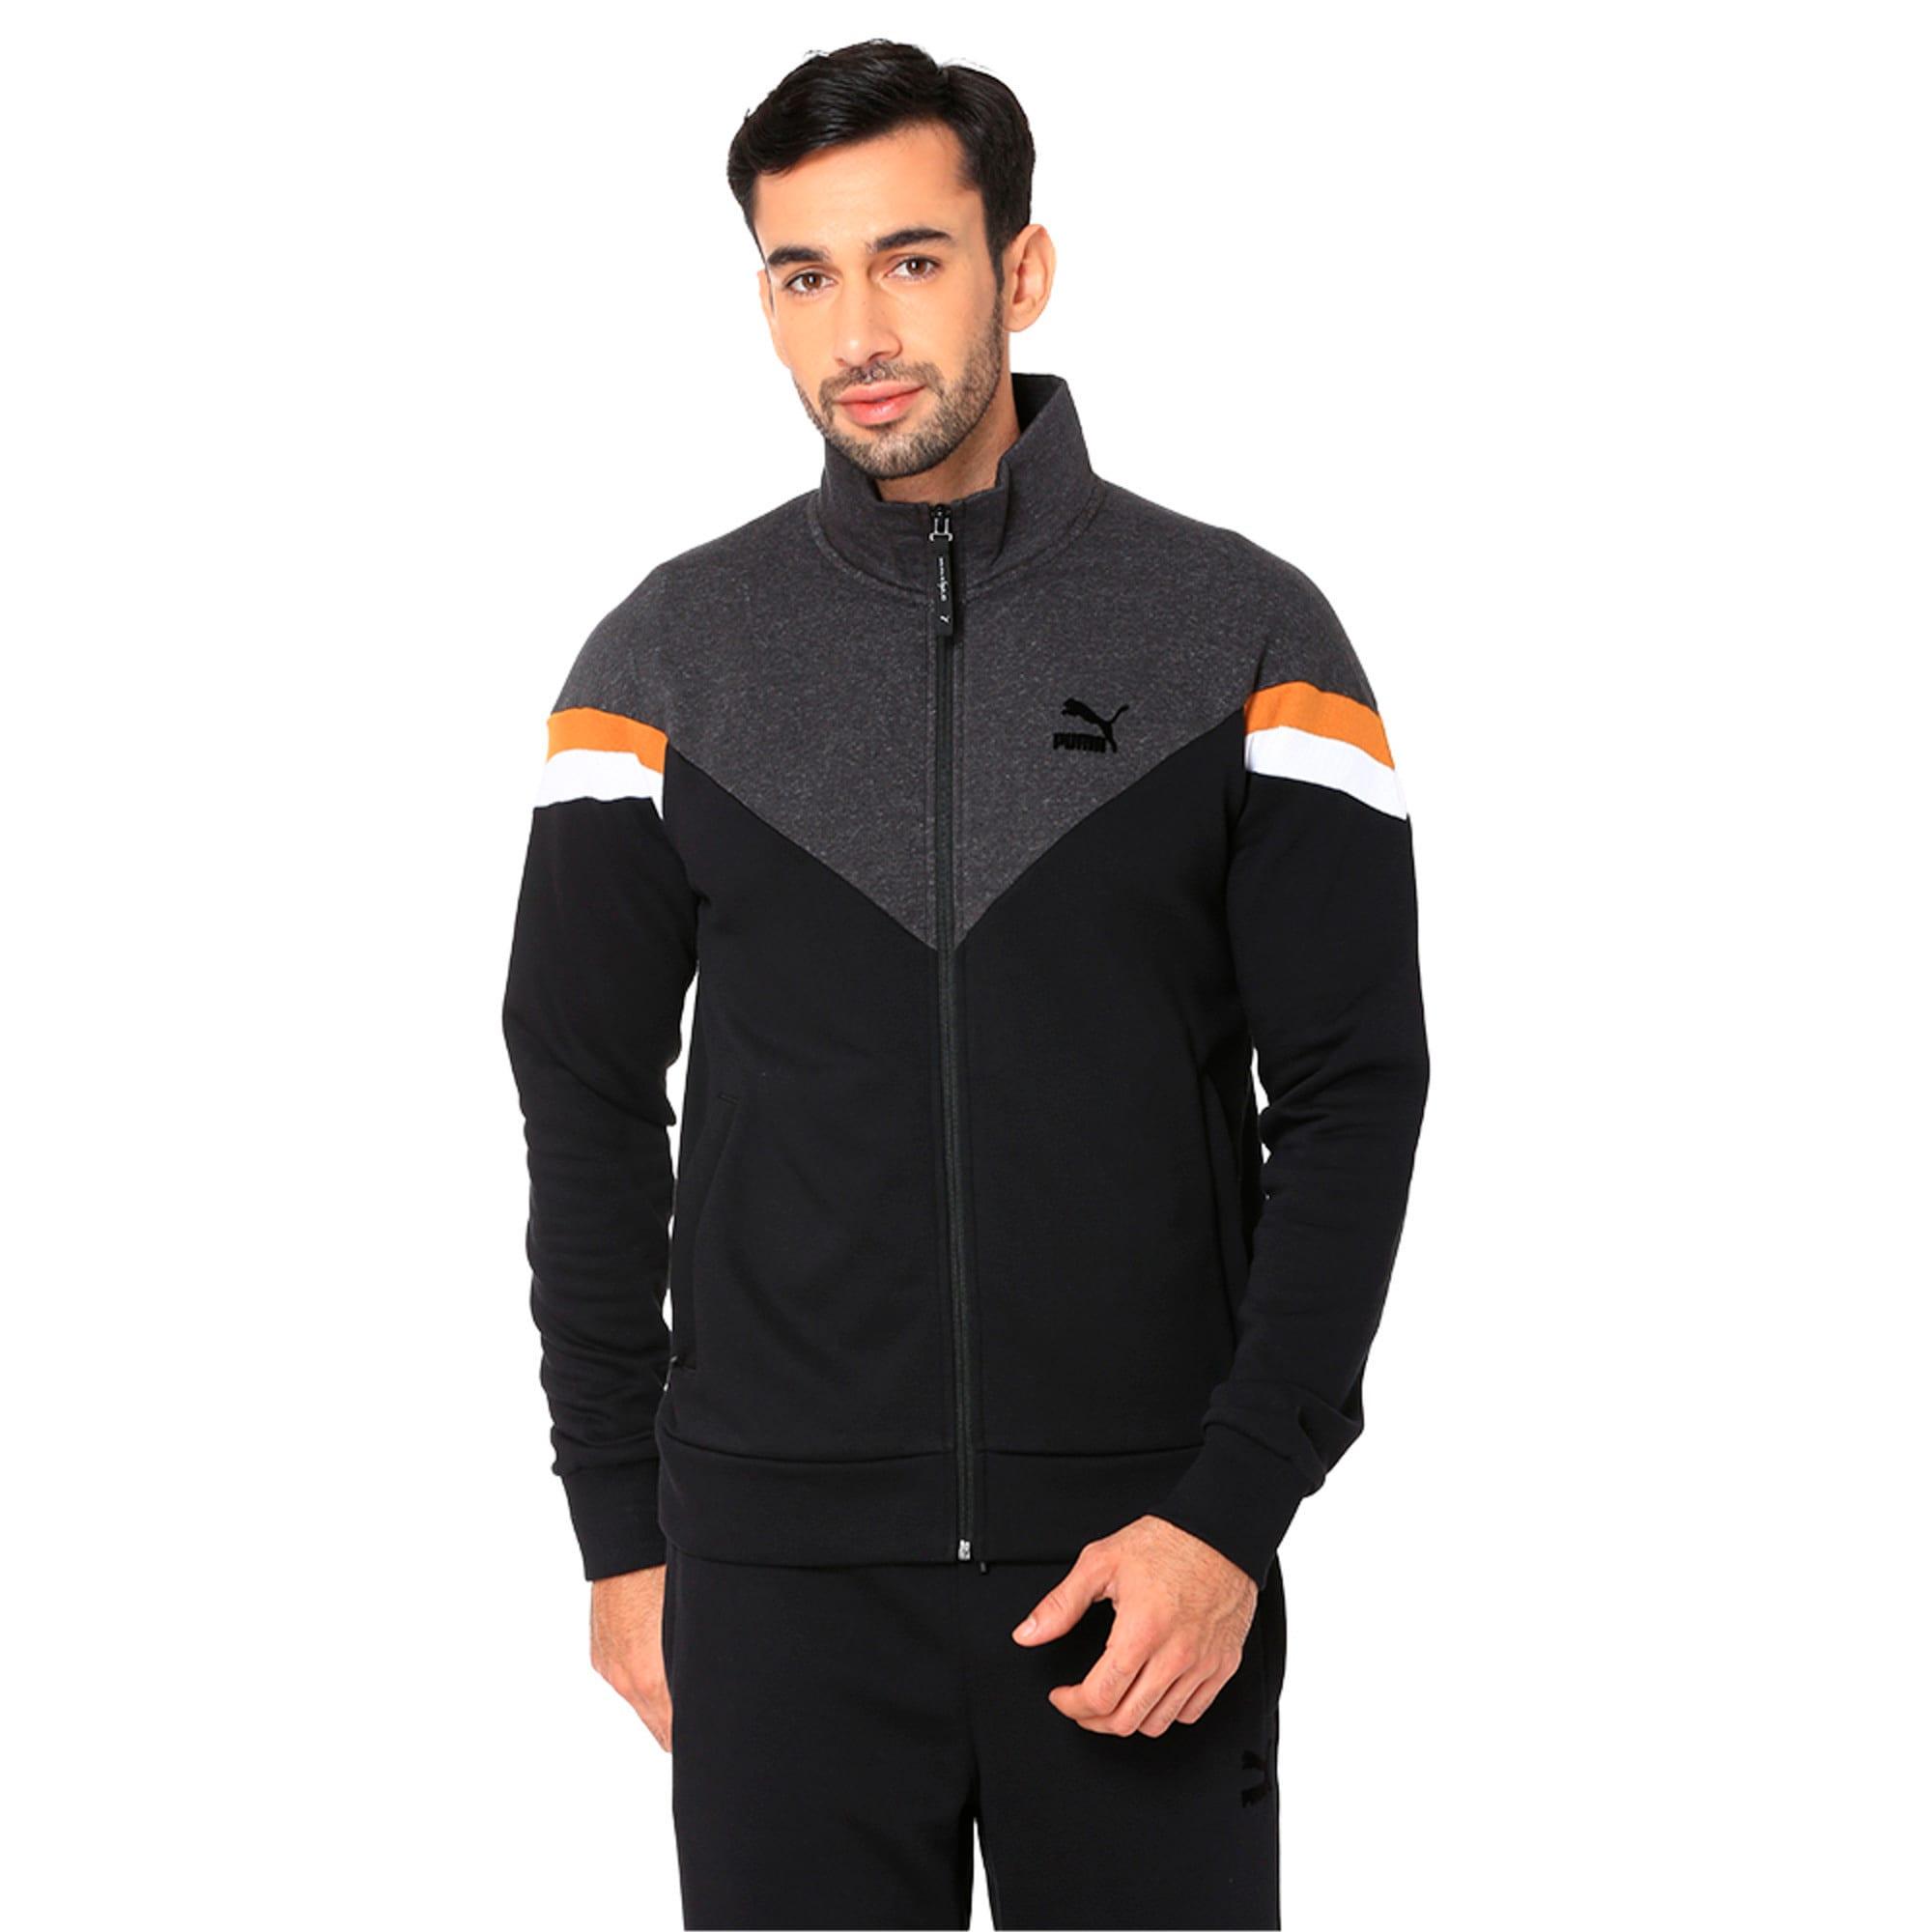 Thumbnail 1 of One8 VK Men's Jacket, Puma Black, medium-IND